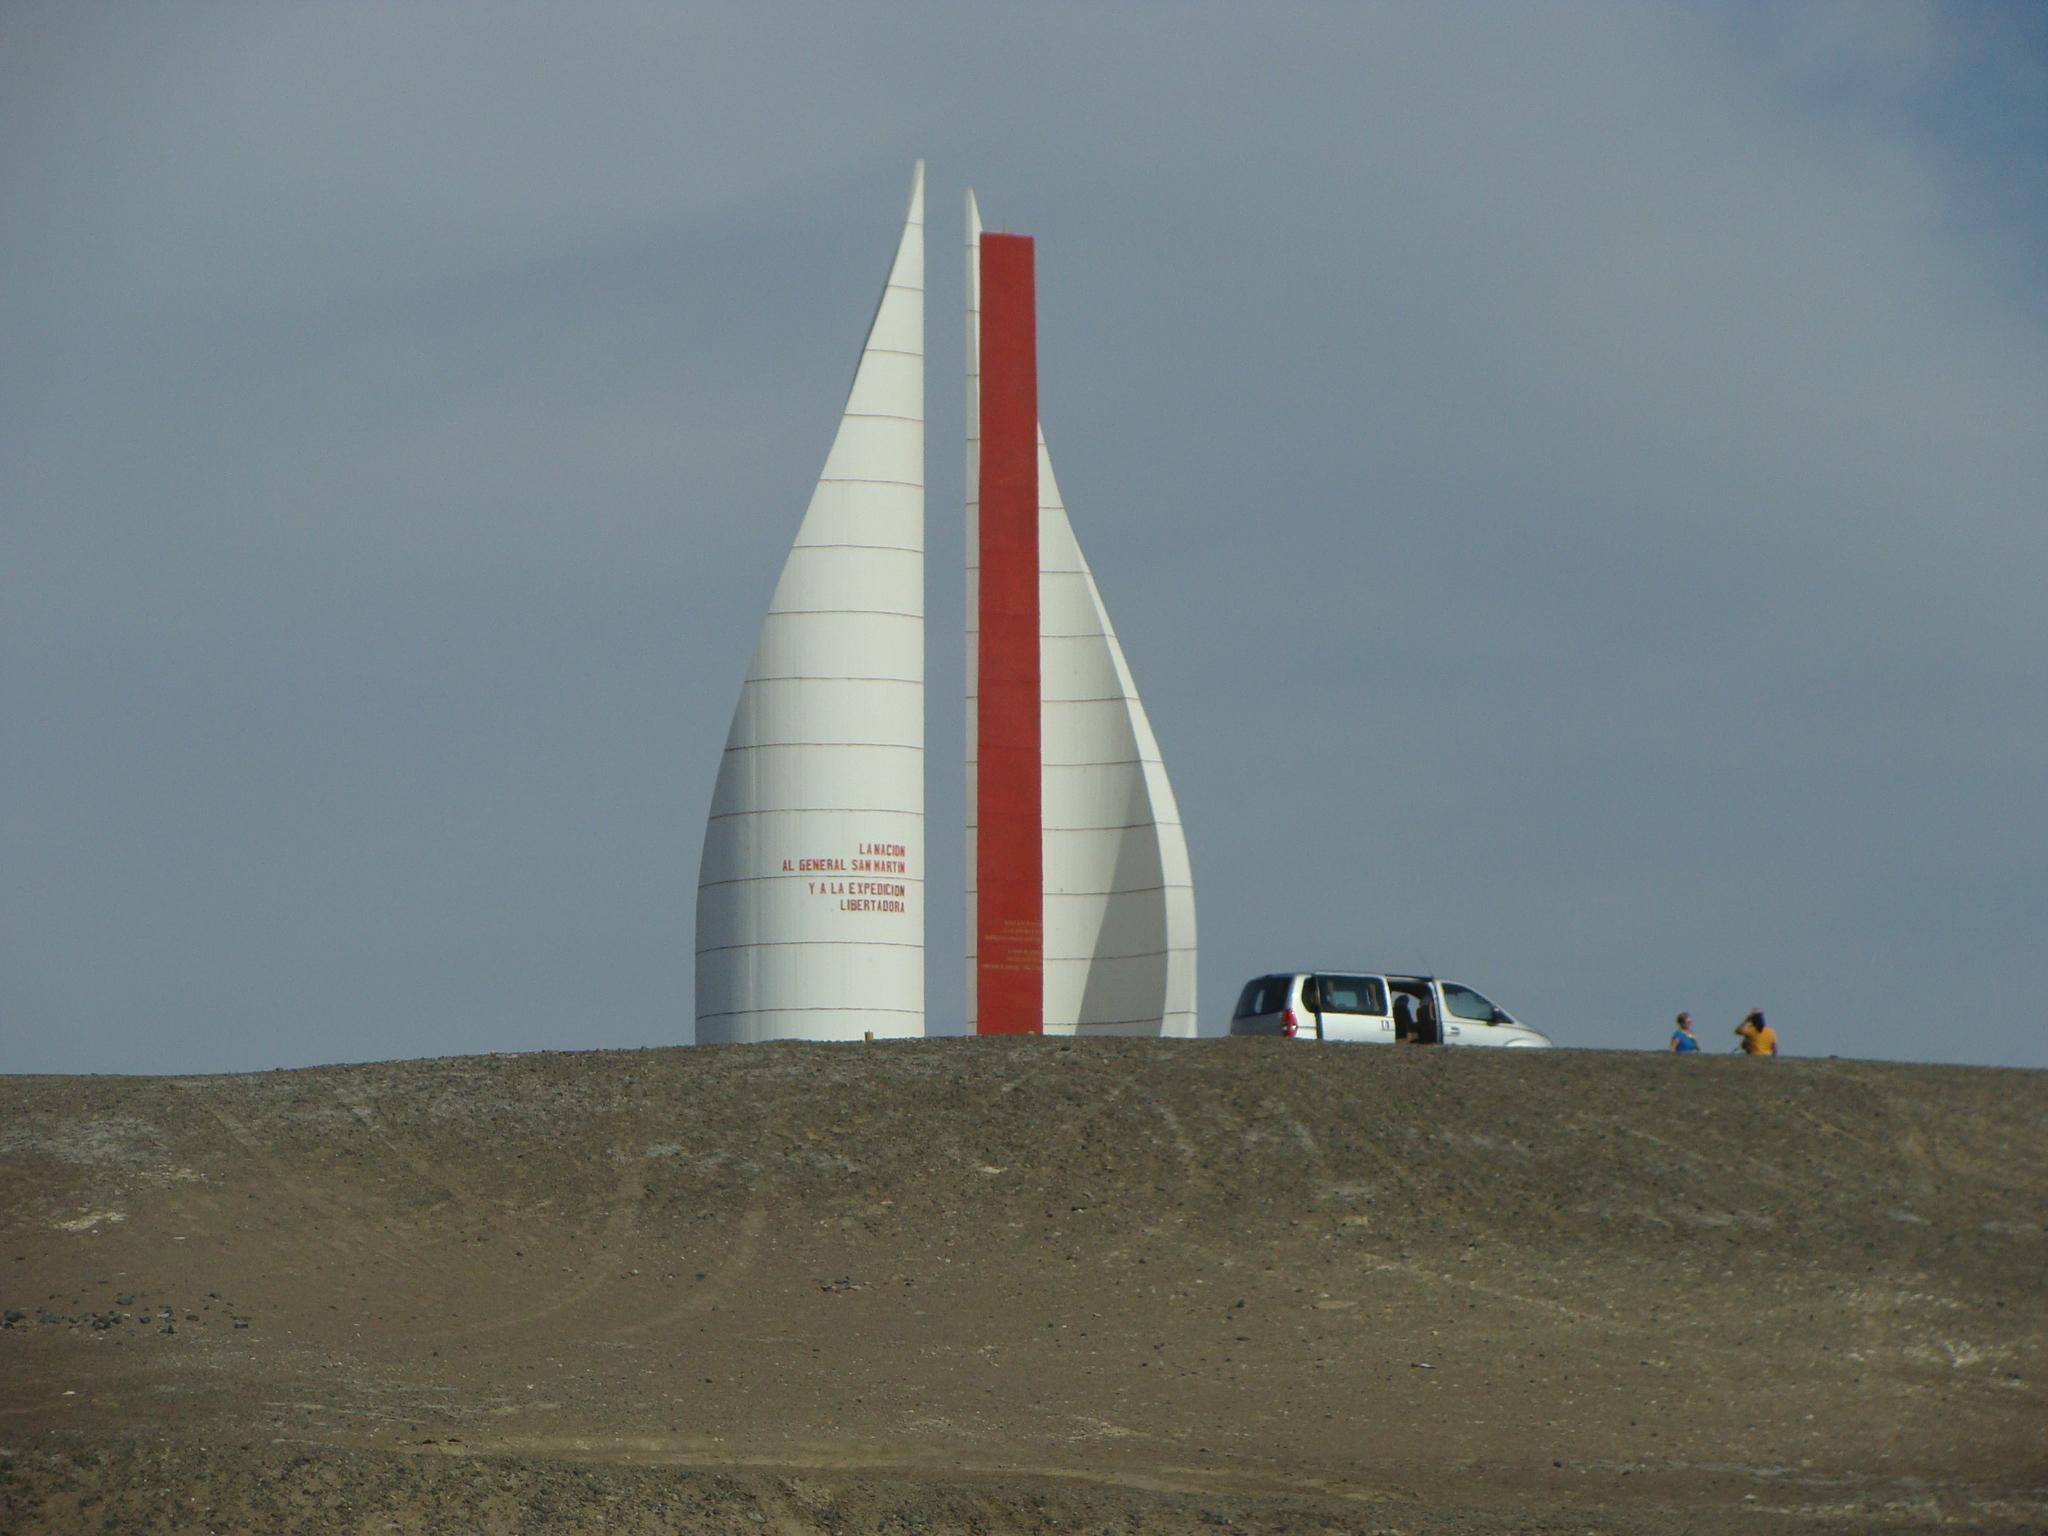 Paracas - památník 21. 2. 2011 16:10